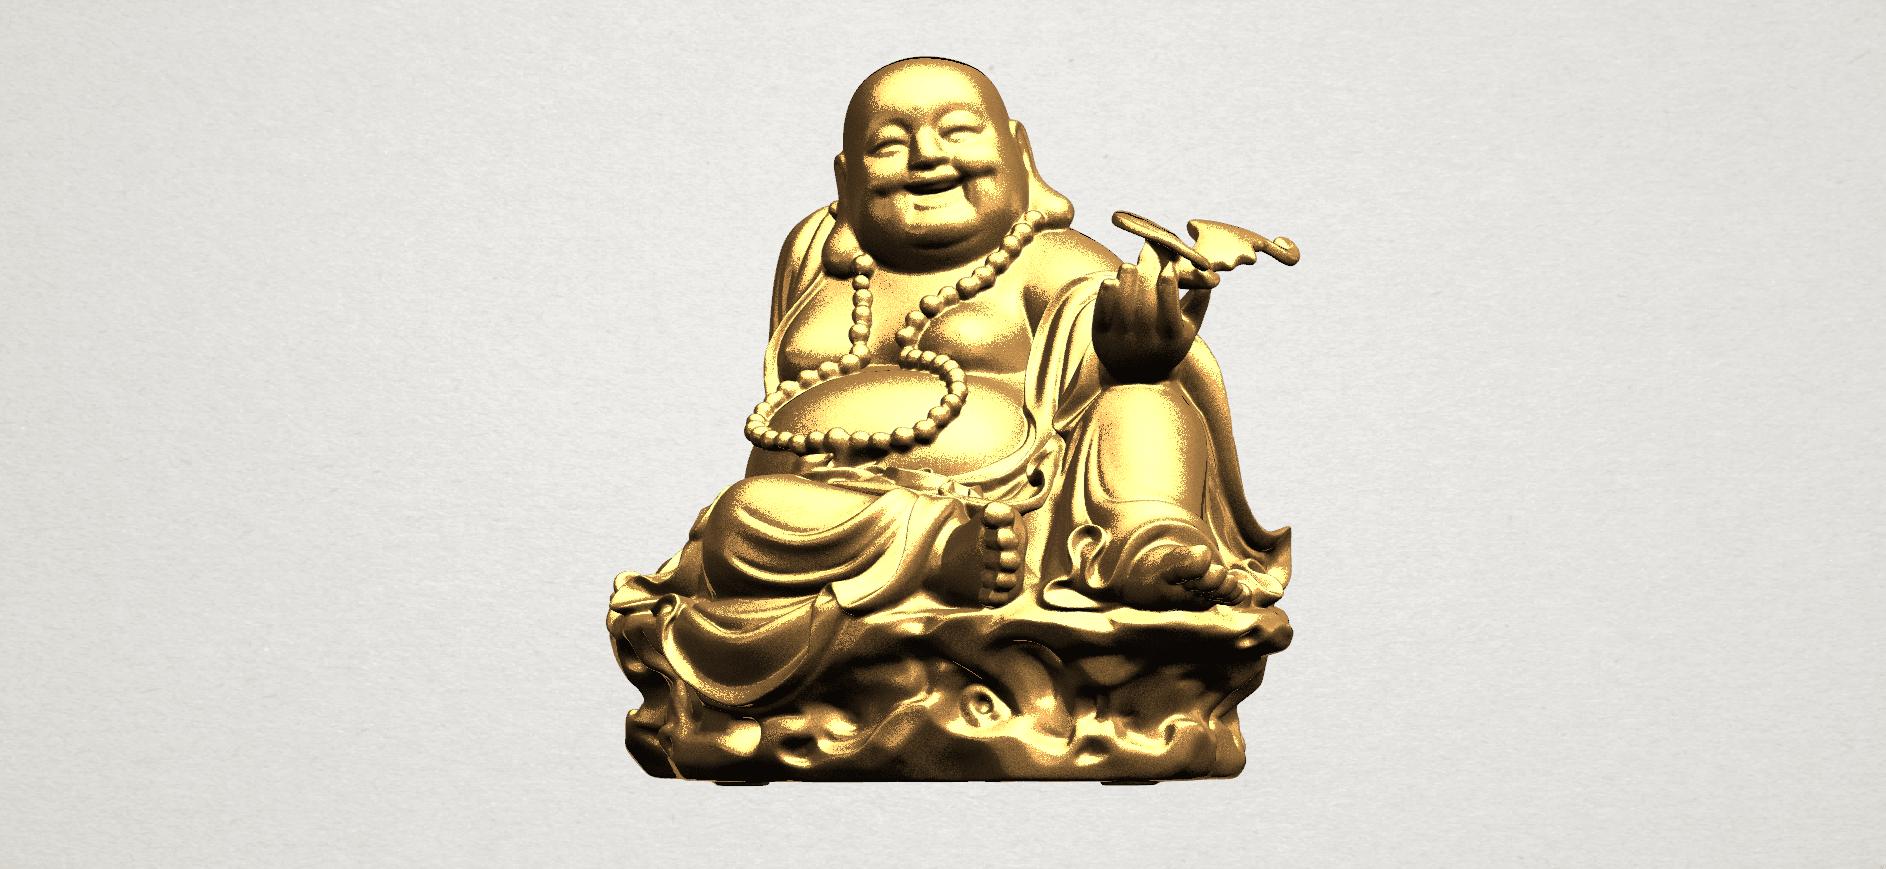 Metteyya Buddha 06 - A01.png Download free STL file Metteyya Buddha 06 • 3D print model, GeorgesNikkei